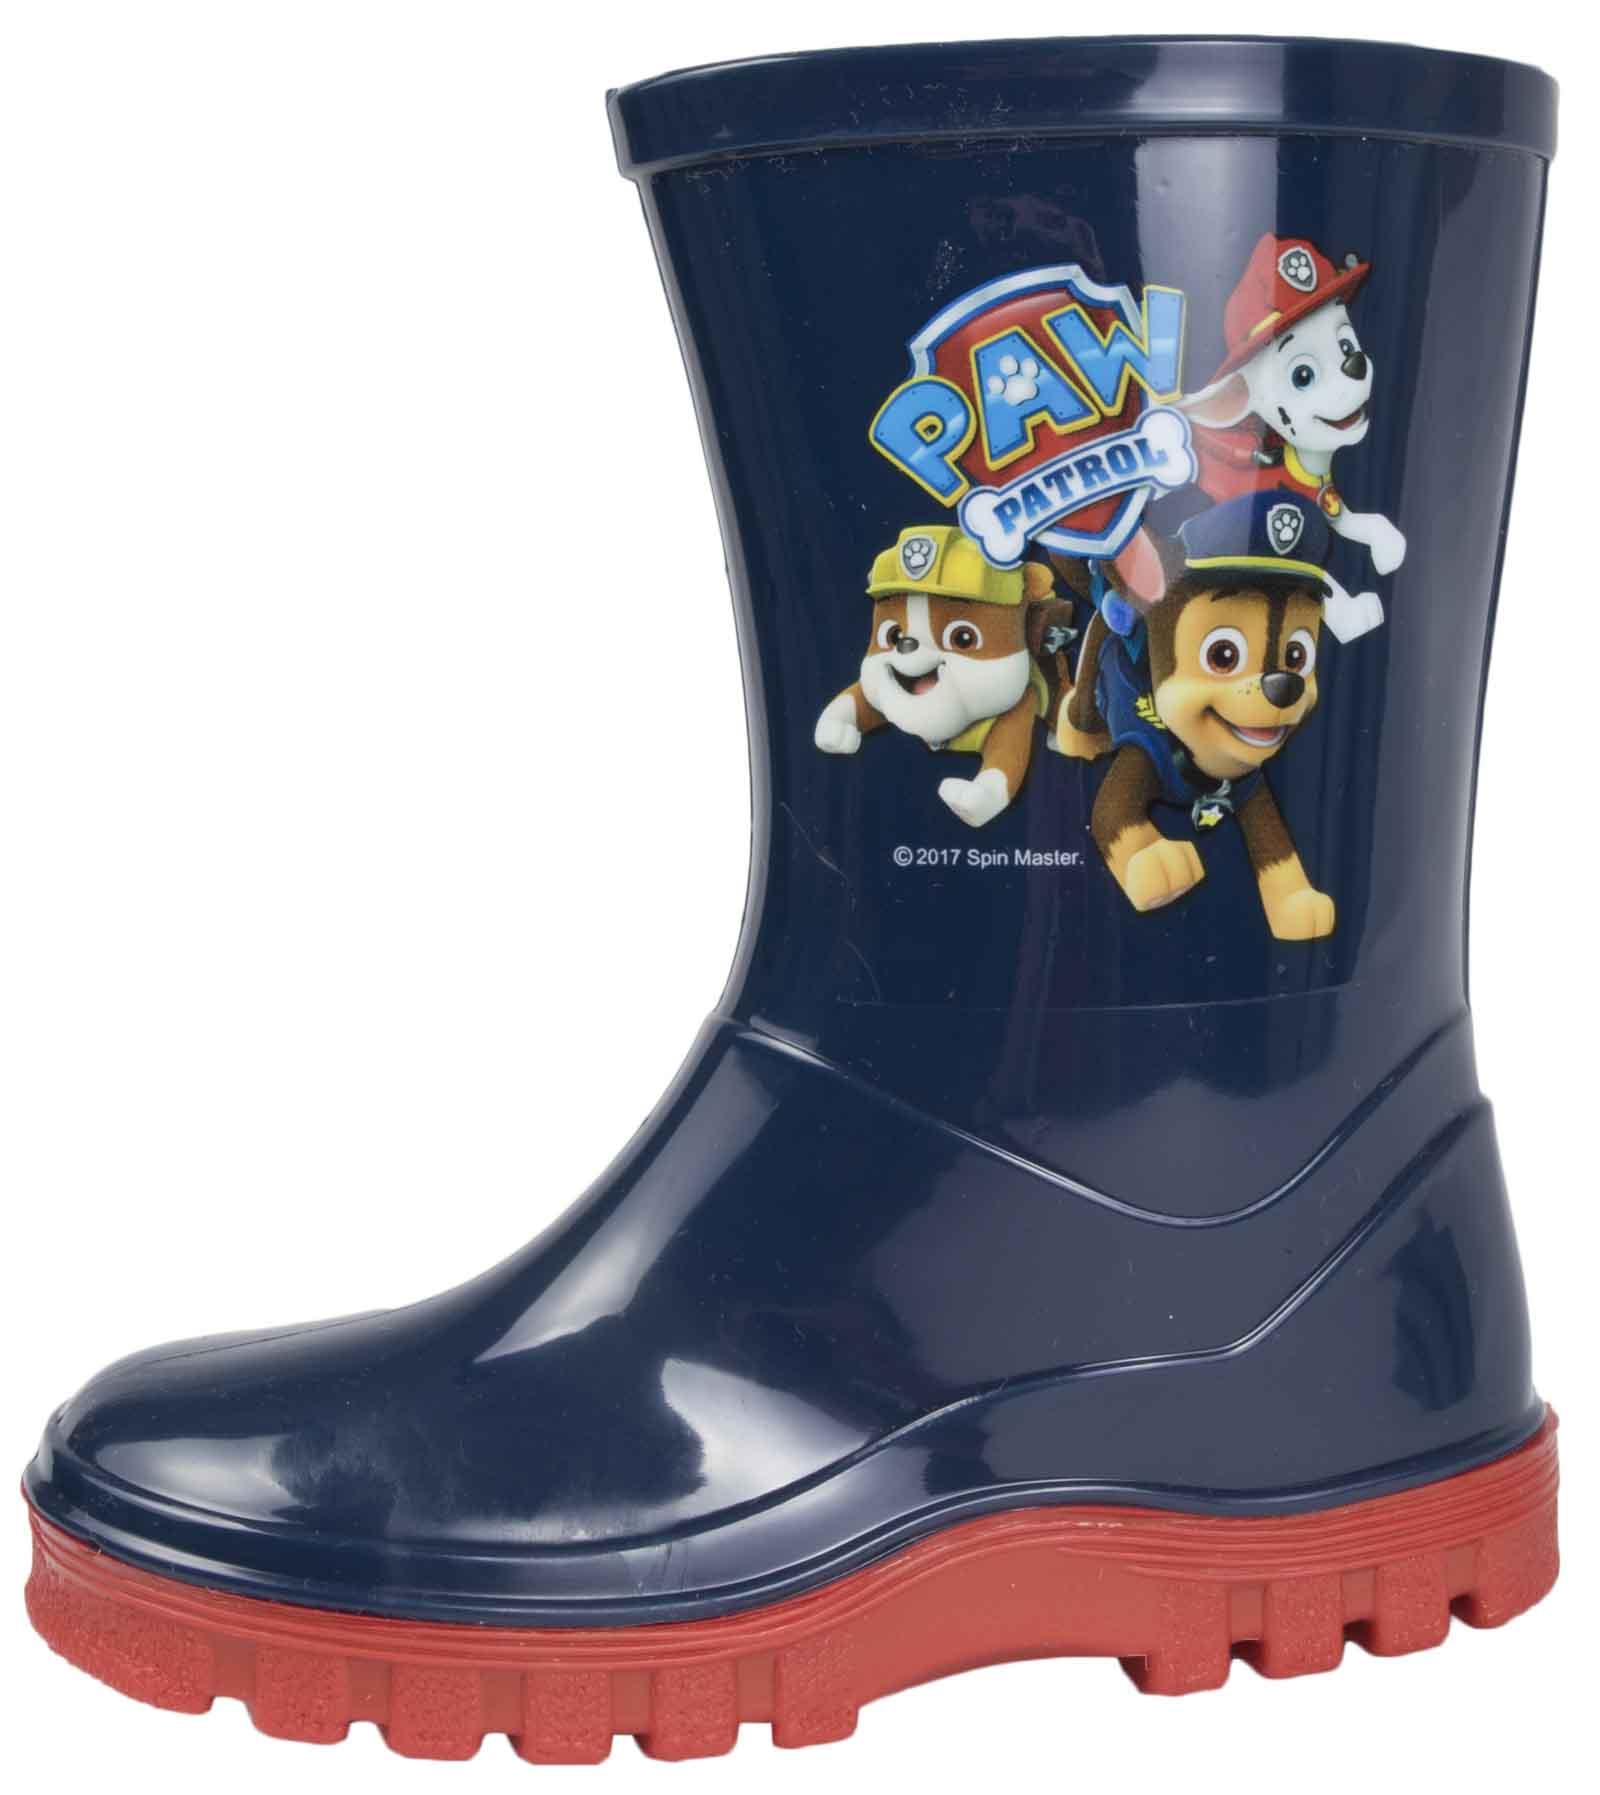 8f46da8d84 Details about Paw Patrol Wellington Boots Rain Wellies Boys Girls Mid Calf  Snow Boots Size